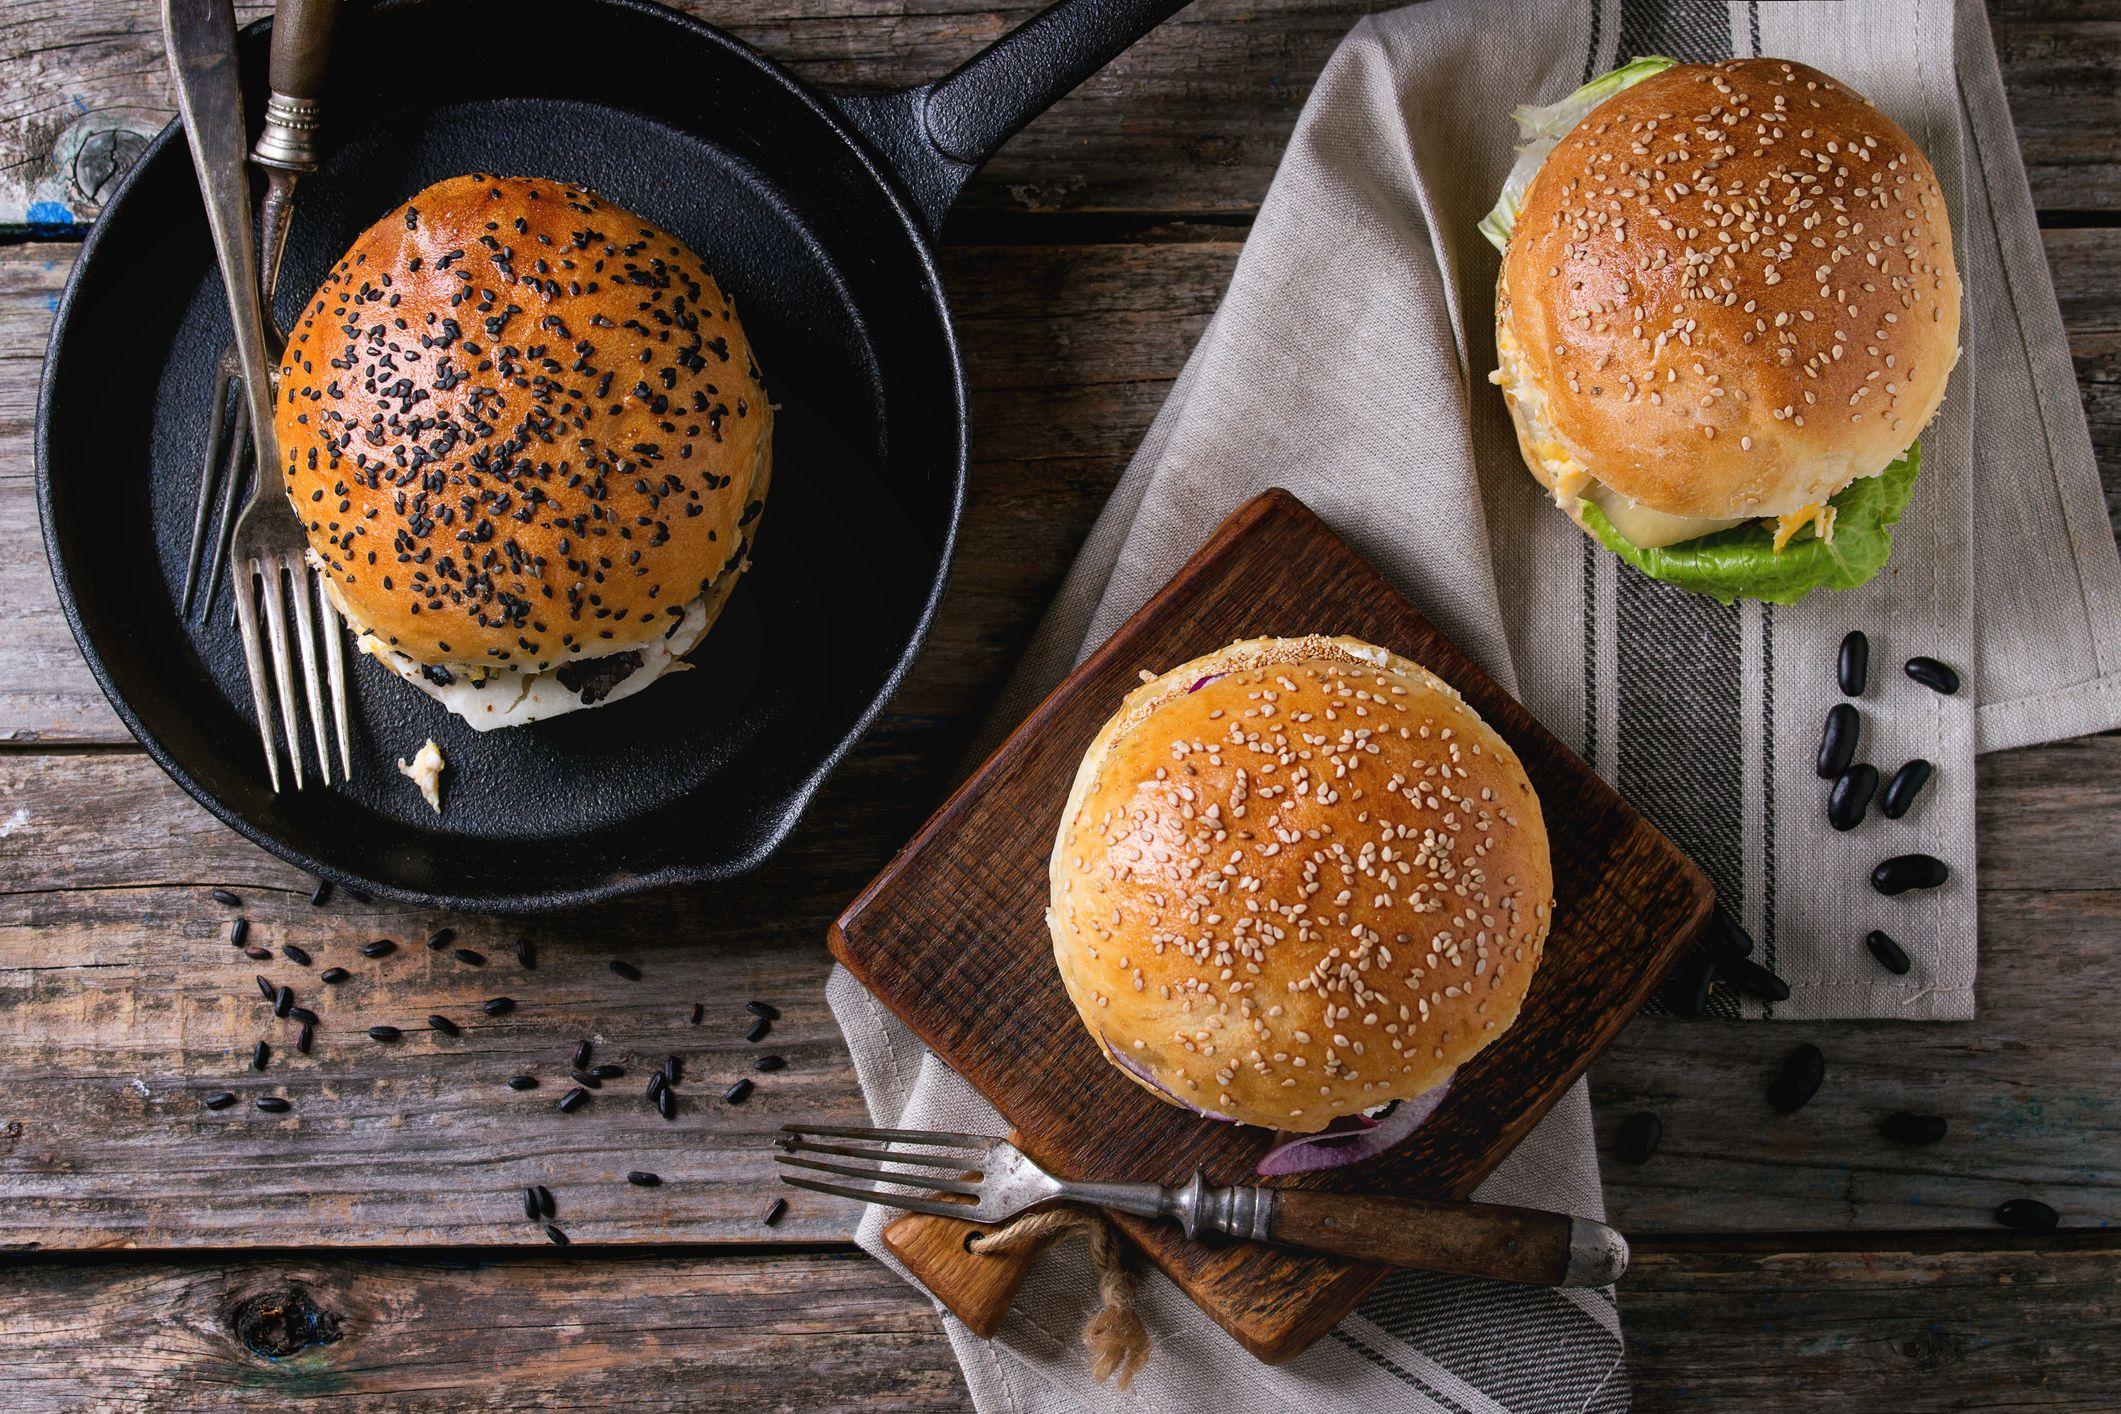 Aldi launches halloumi burgers and they sound divine